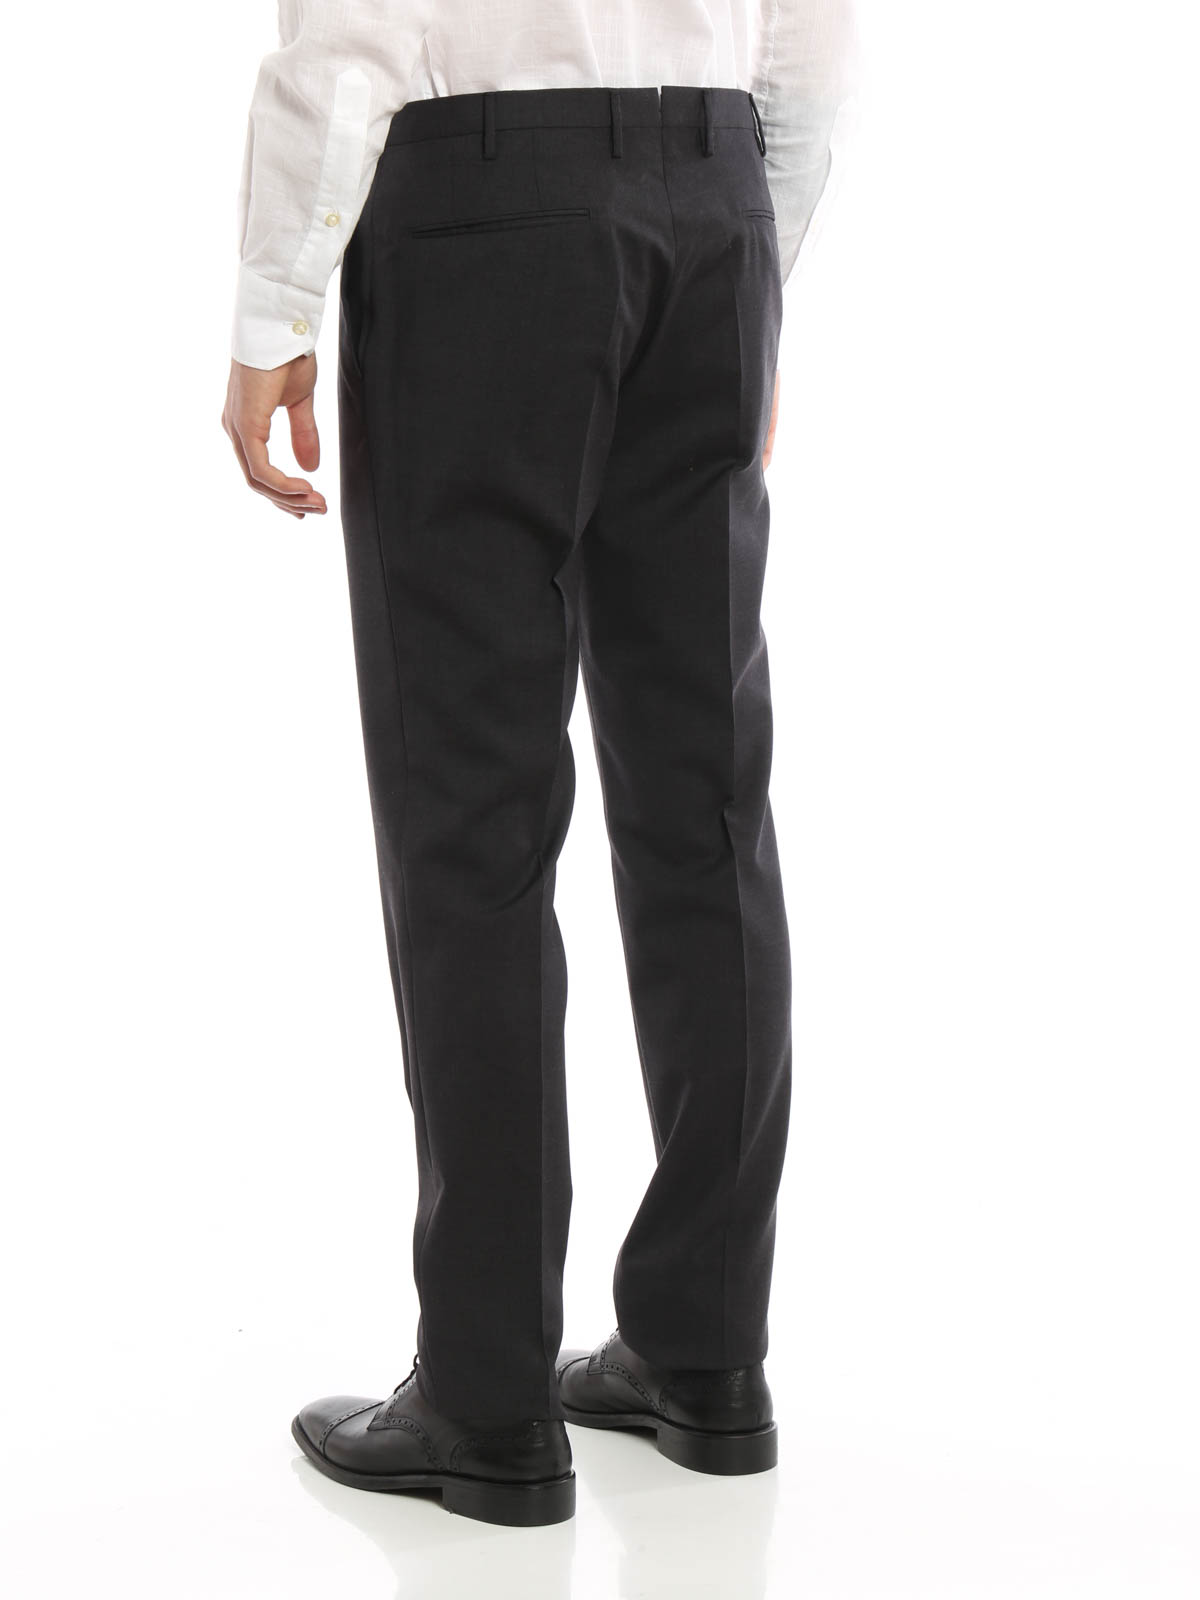 1b4a58360dda Incotex - Super 100 s light wool trousers - Tailored   Formal ...